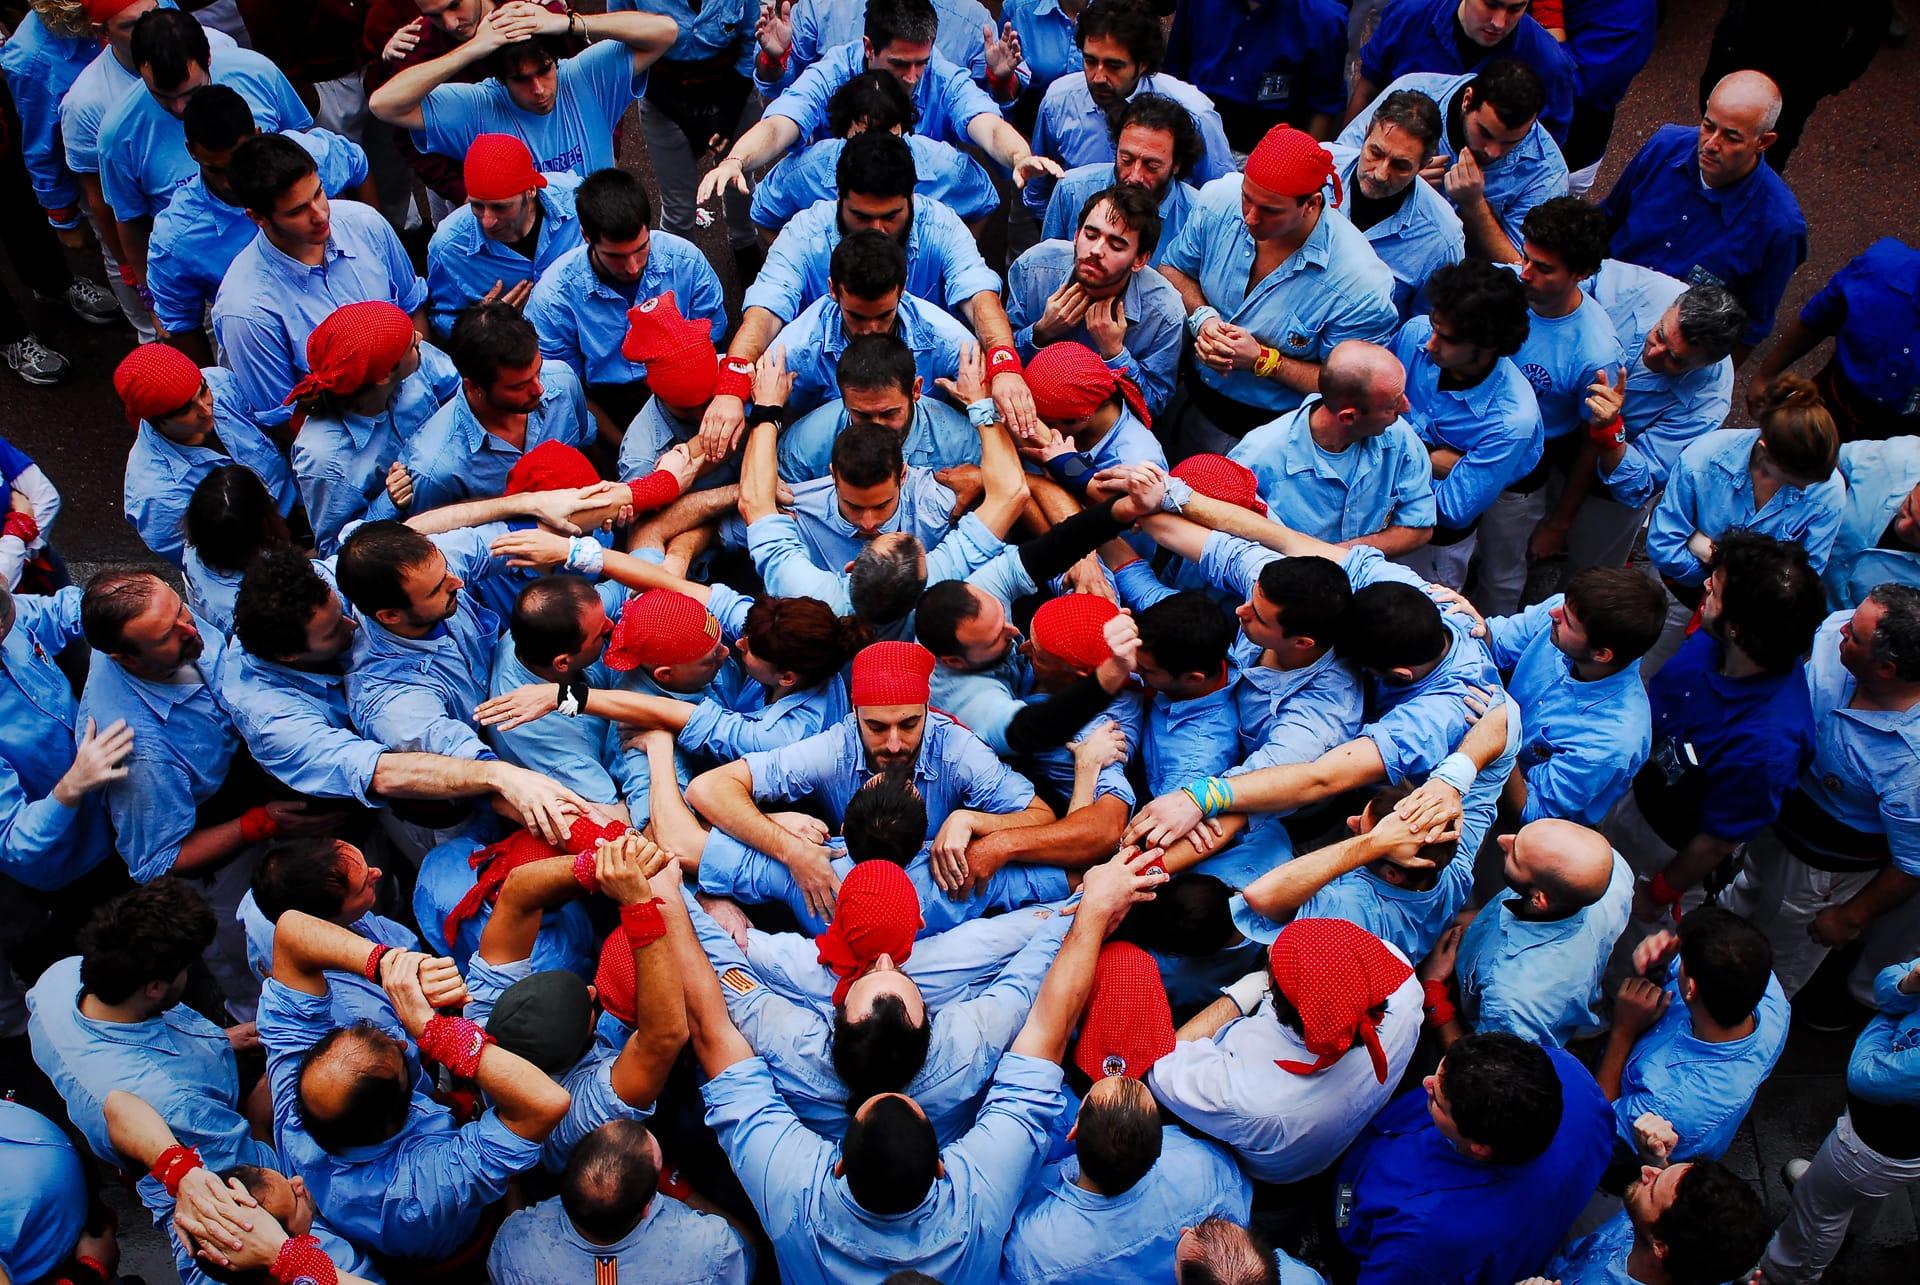 """The Colour Blue"" street photograph by Sergi Escribano"